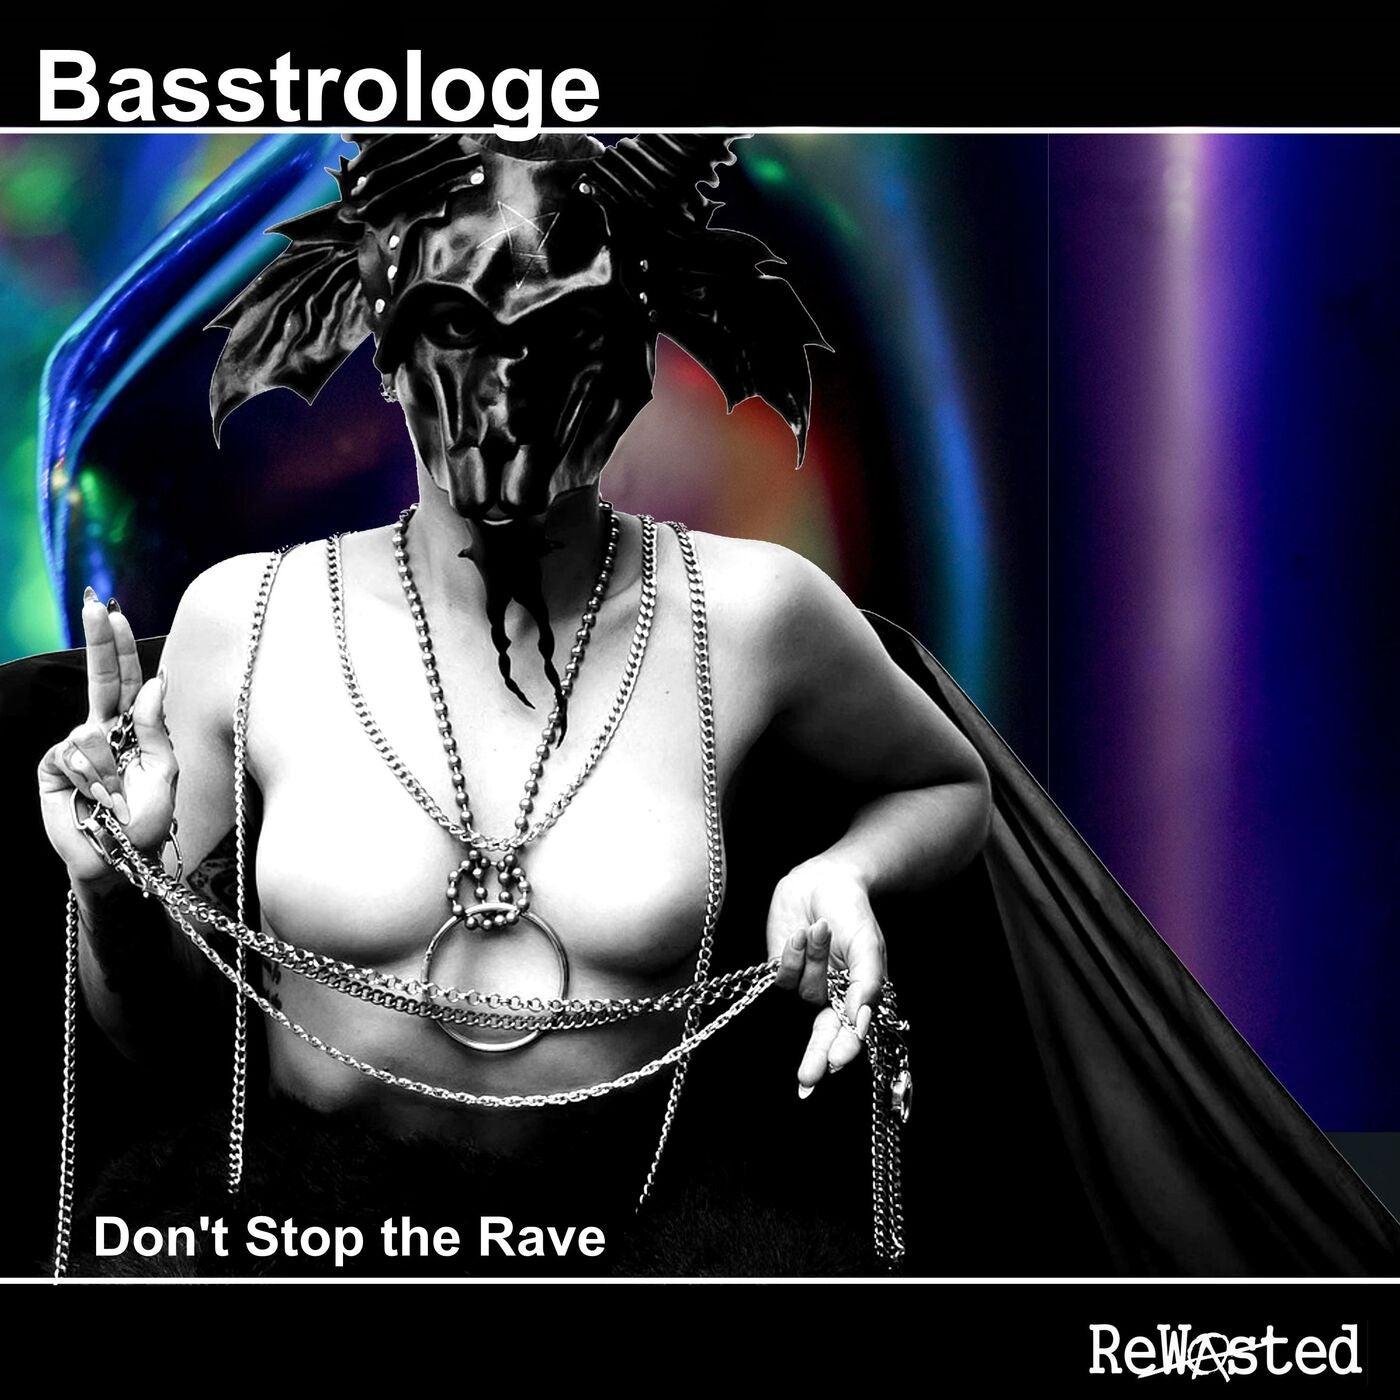 Don't Stop the Rave (Sebastian Groth Remix)